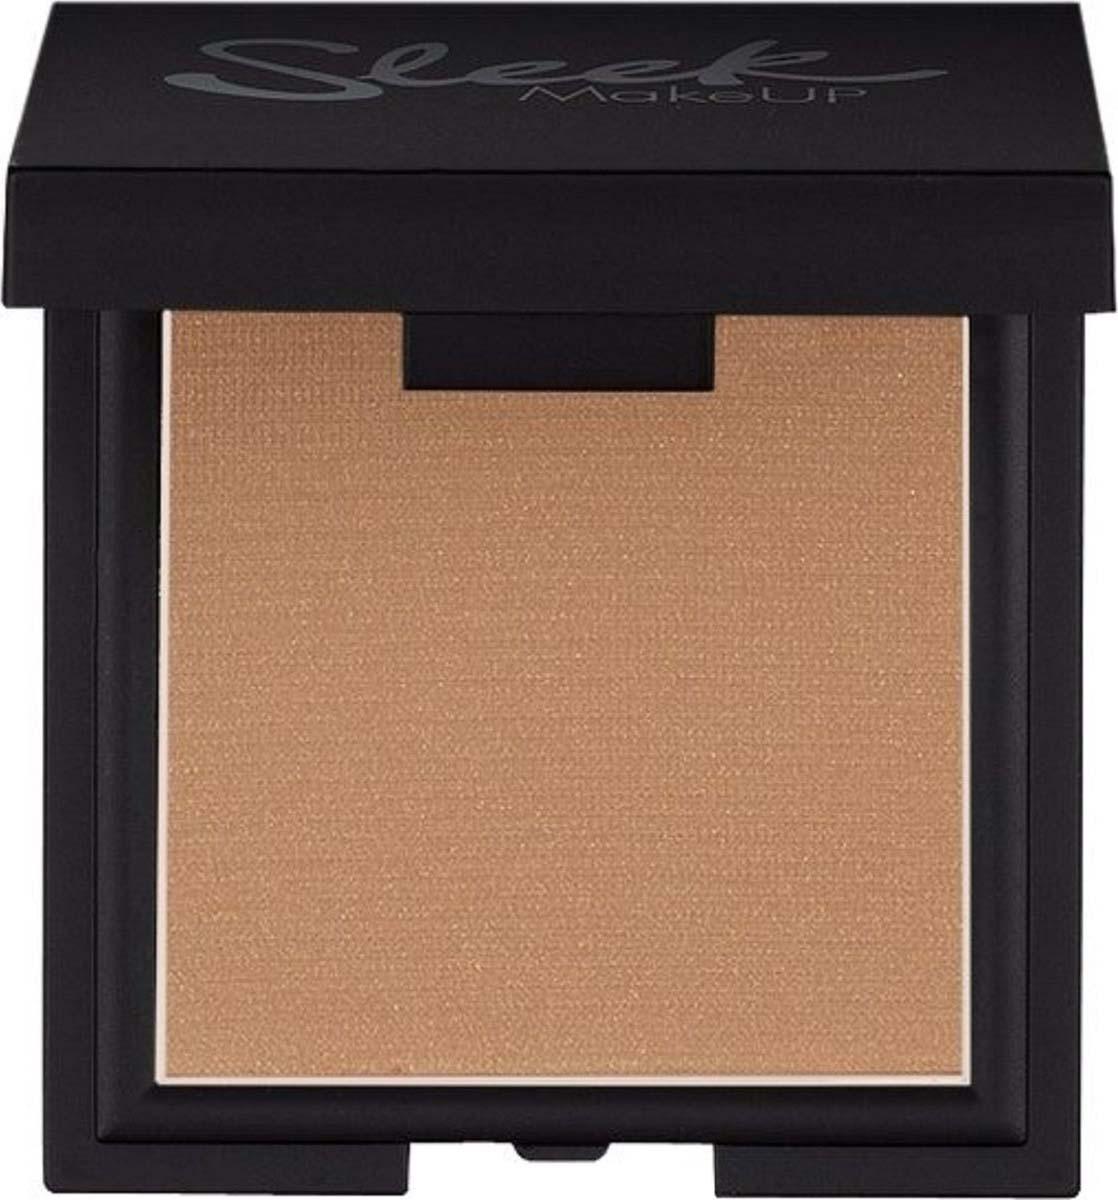 Пудра Sleek MakeUP Suede Effect Pressed Powder 02, 58,5 г